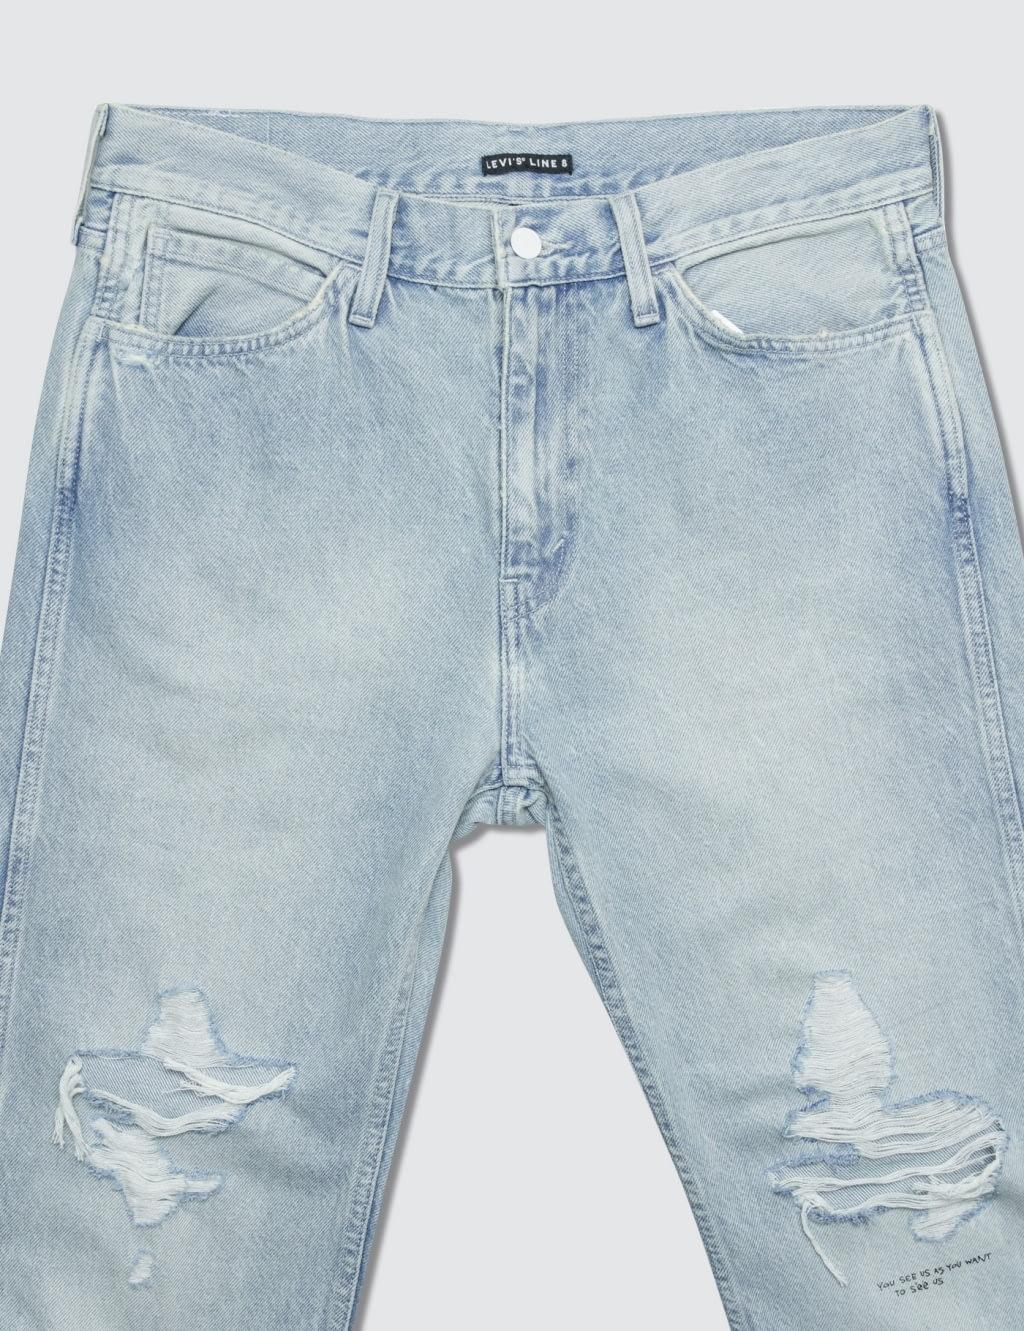 Straight Jeans Social Studies - L8 social studies Levi's 1gdm5n